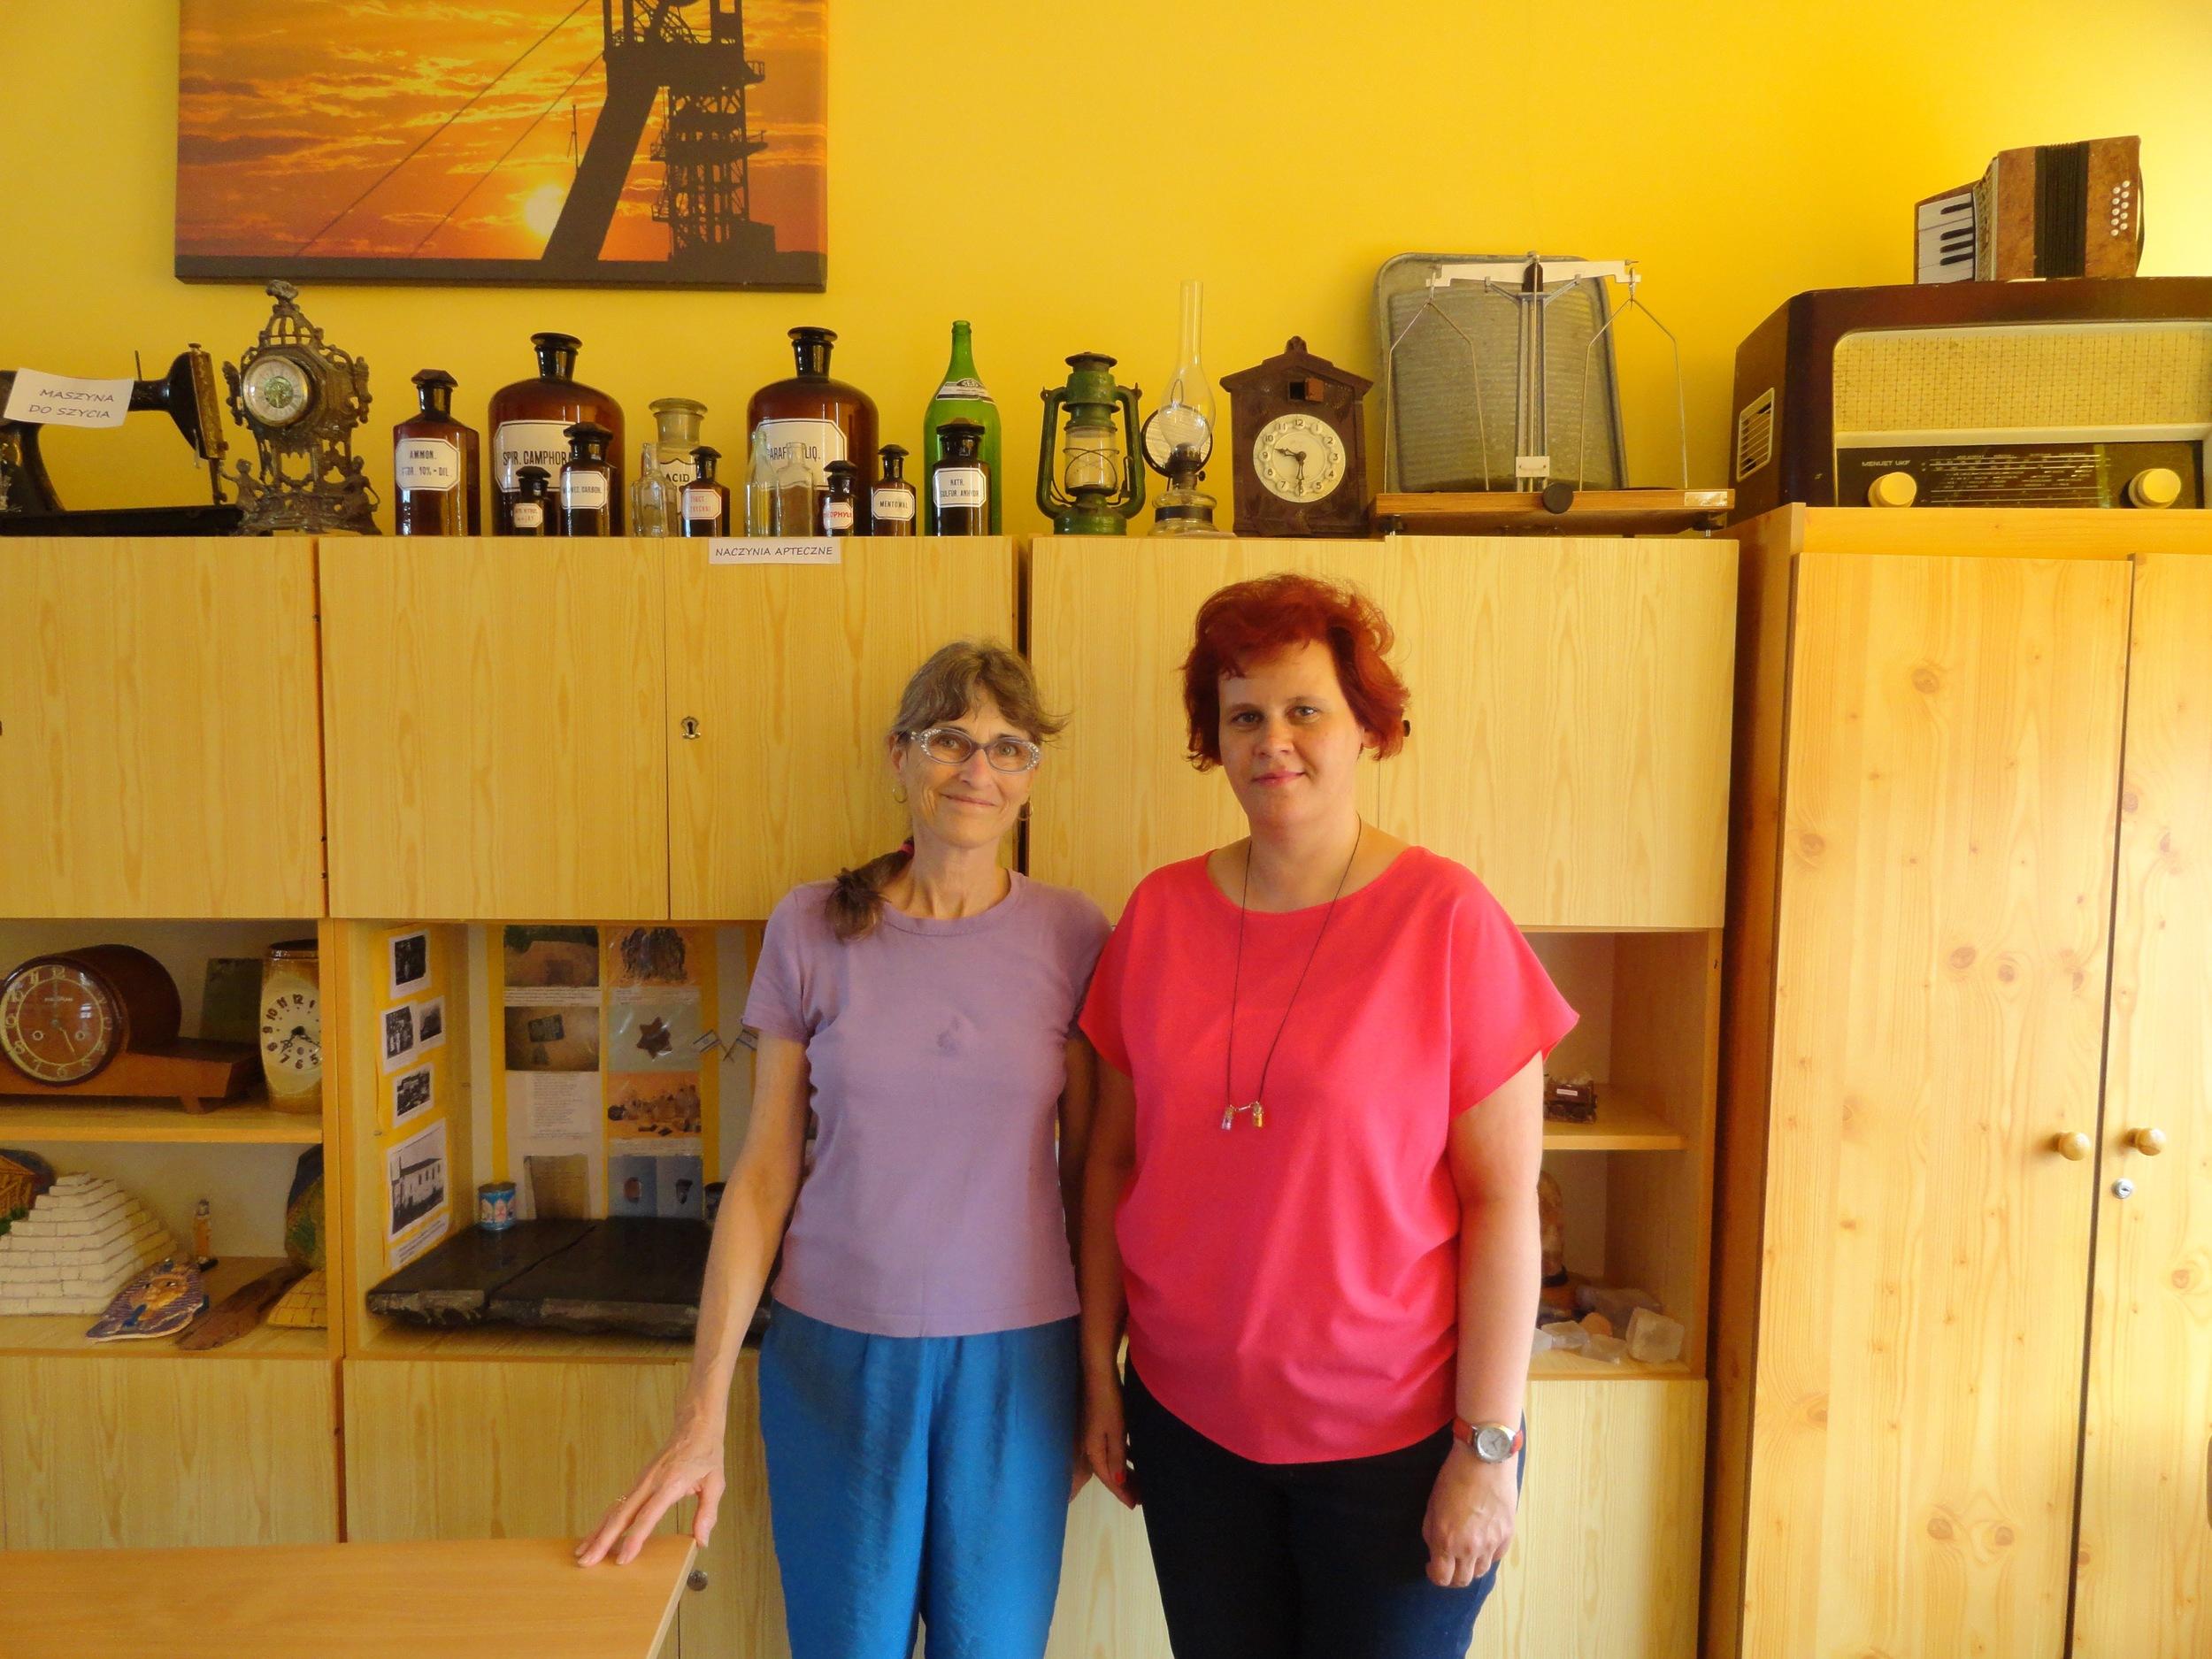 Ywona Kucharska and me in front of Jewish niche in history room.